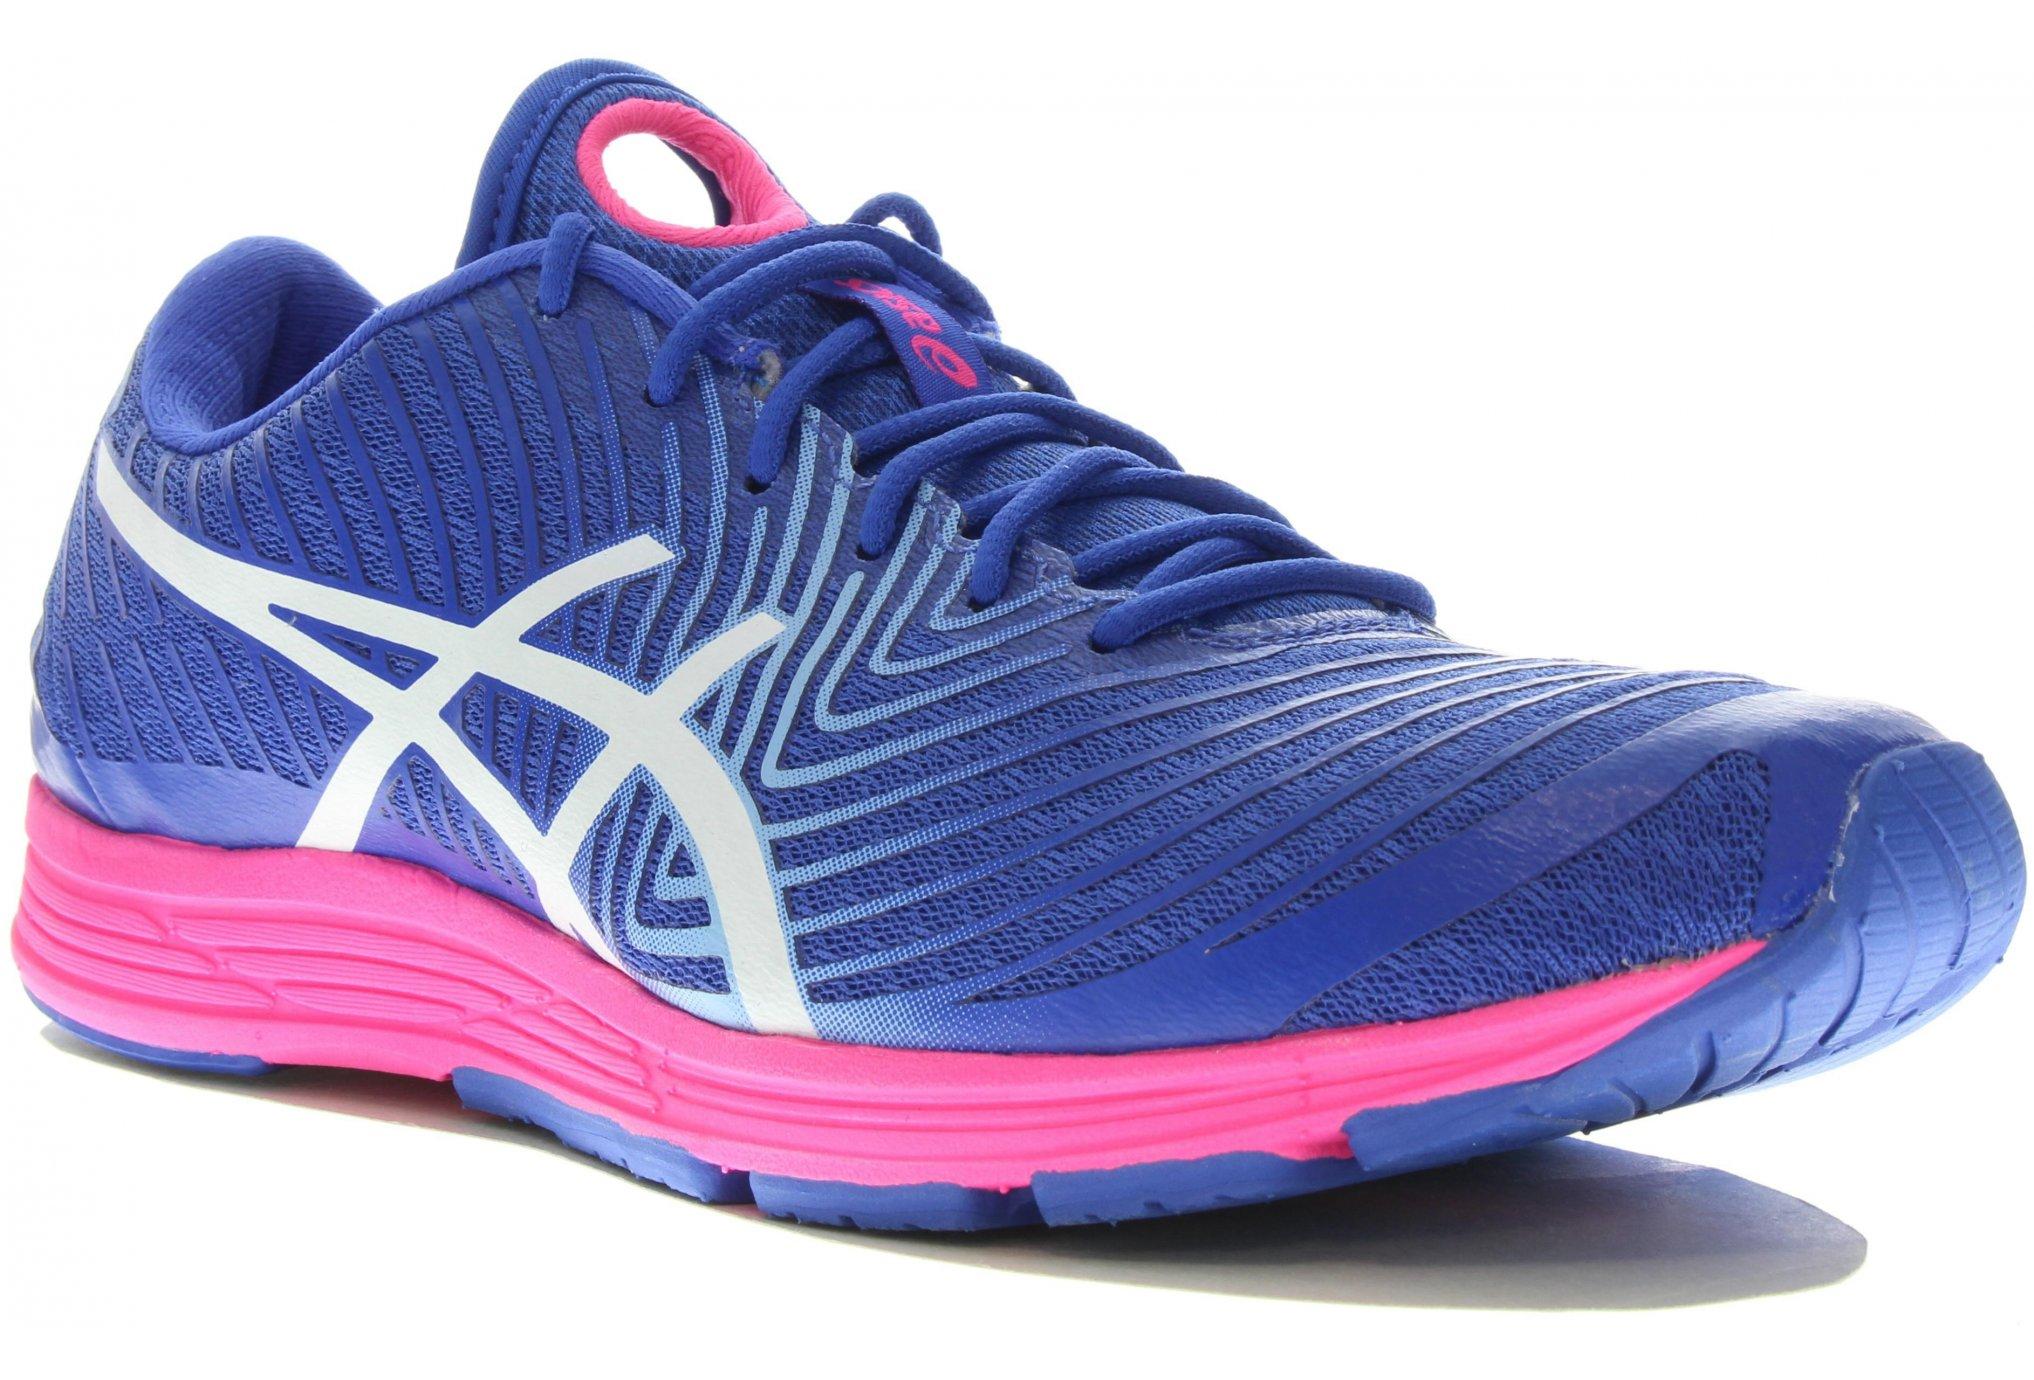 Asics Gel-Hyper Tri 3 W Chaussures running femme